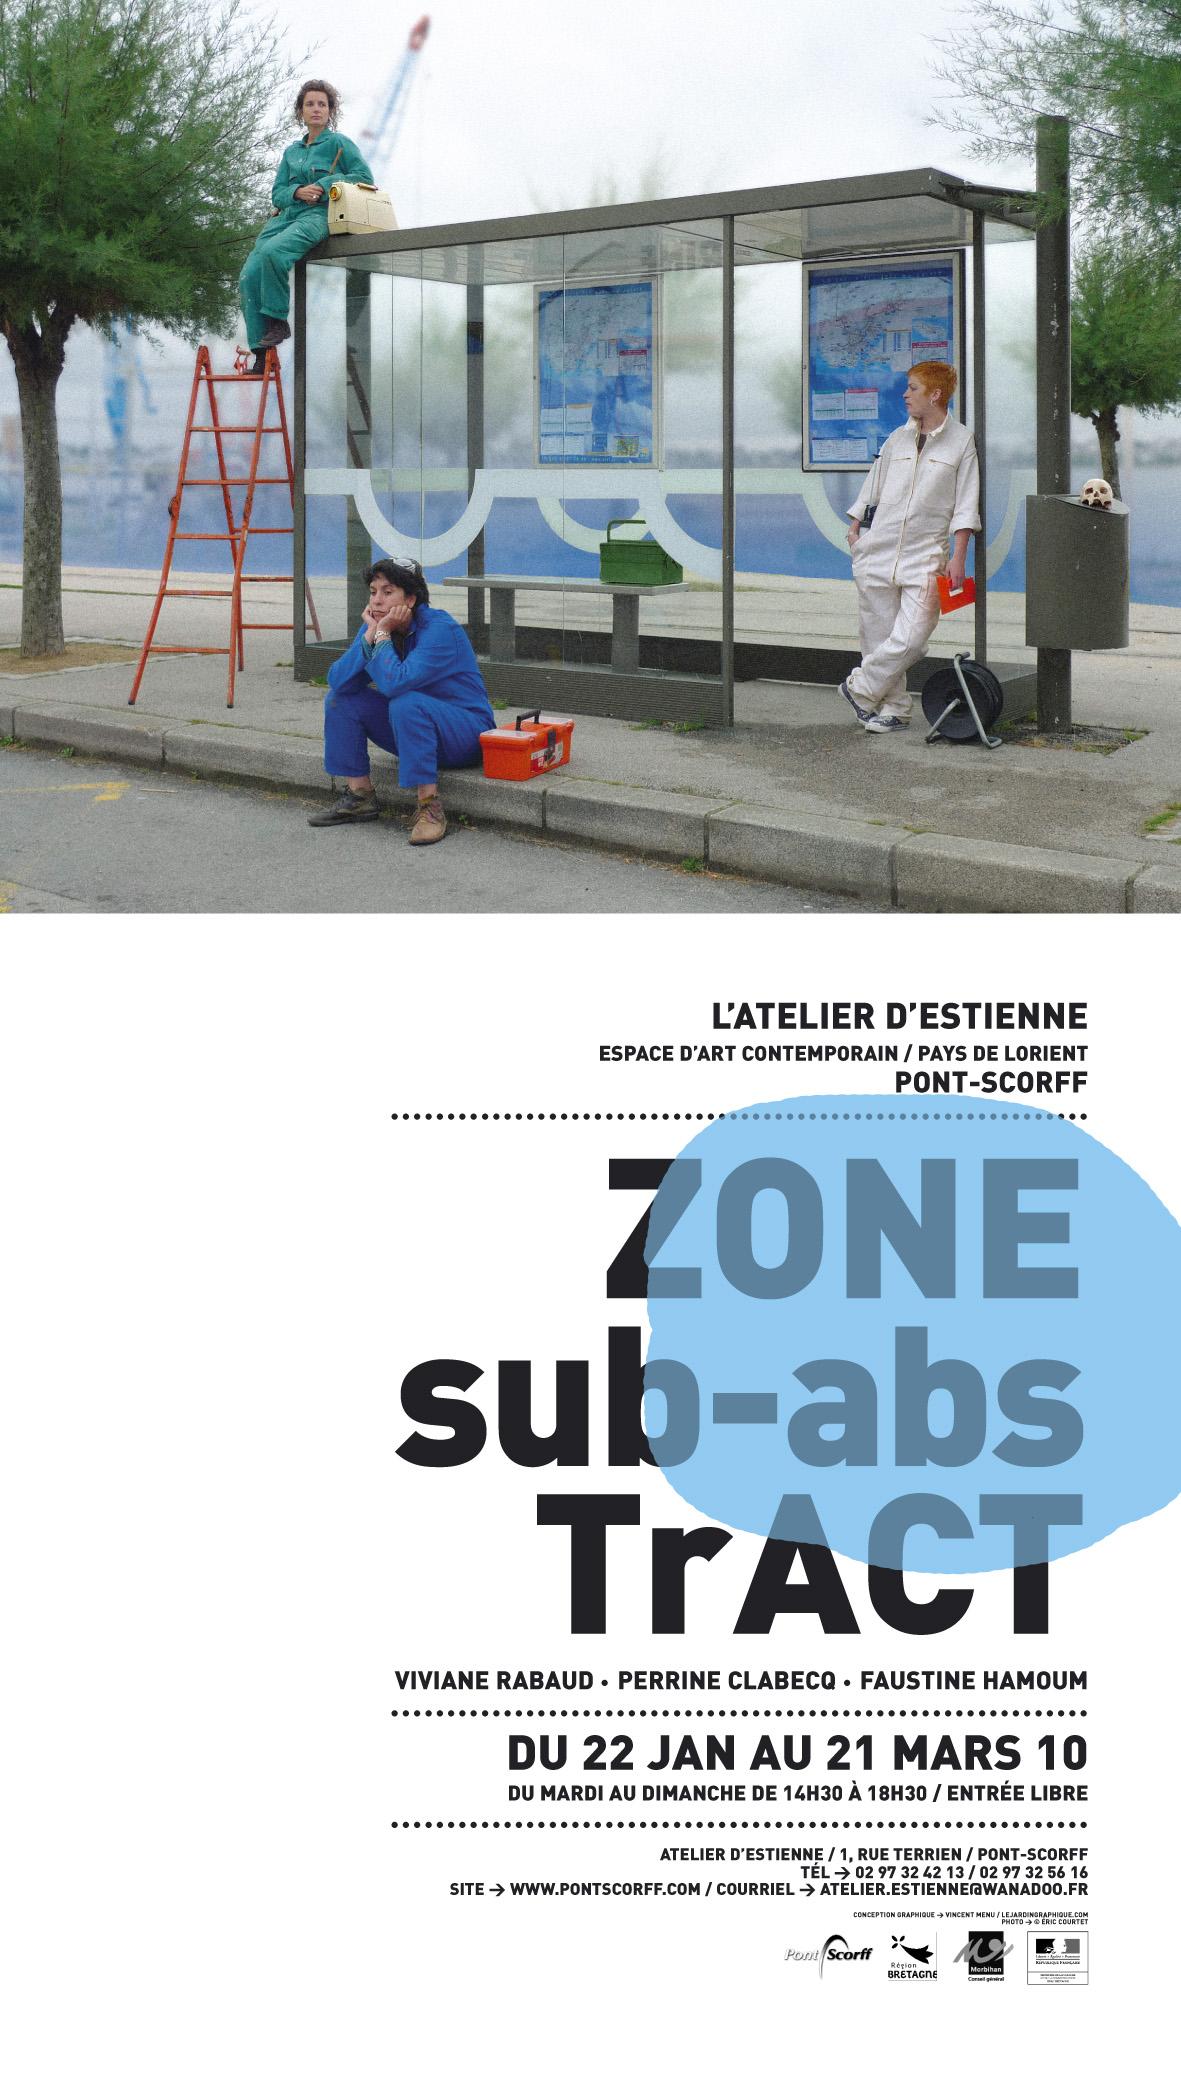 zone sub-abstract